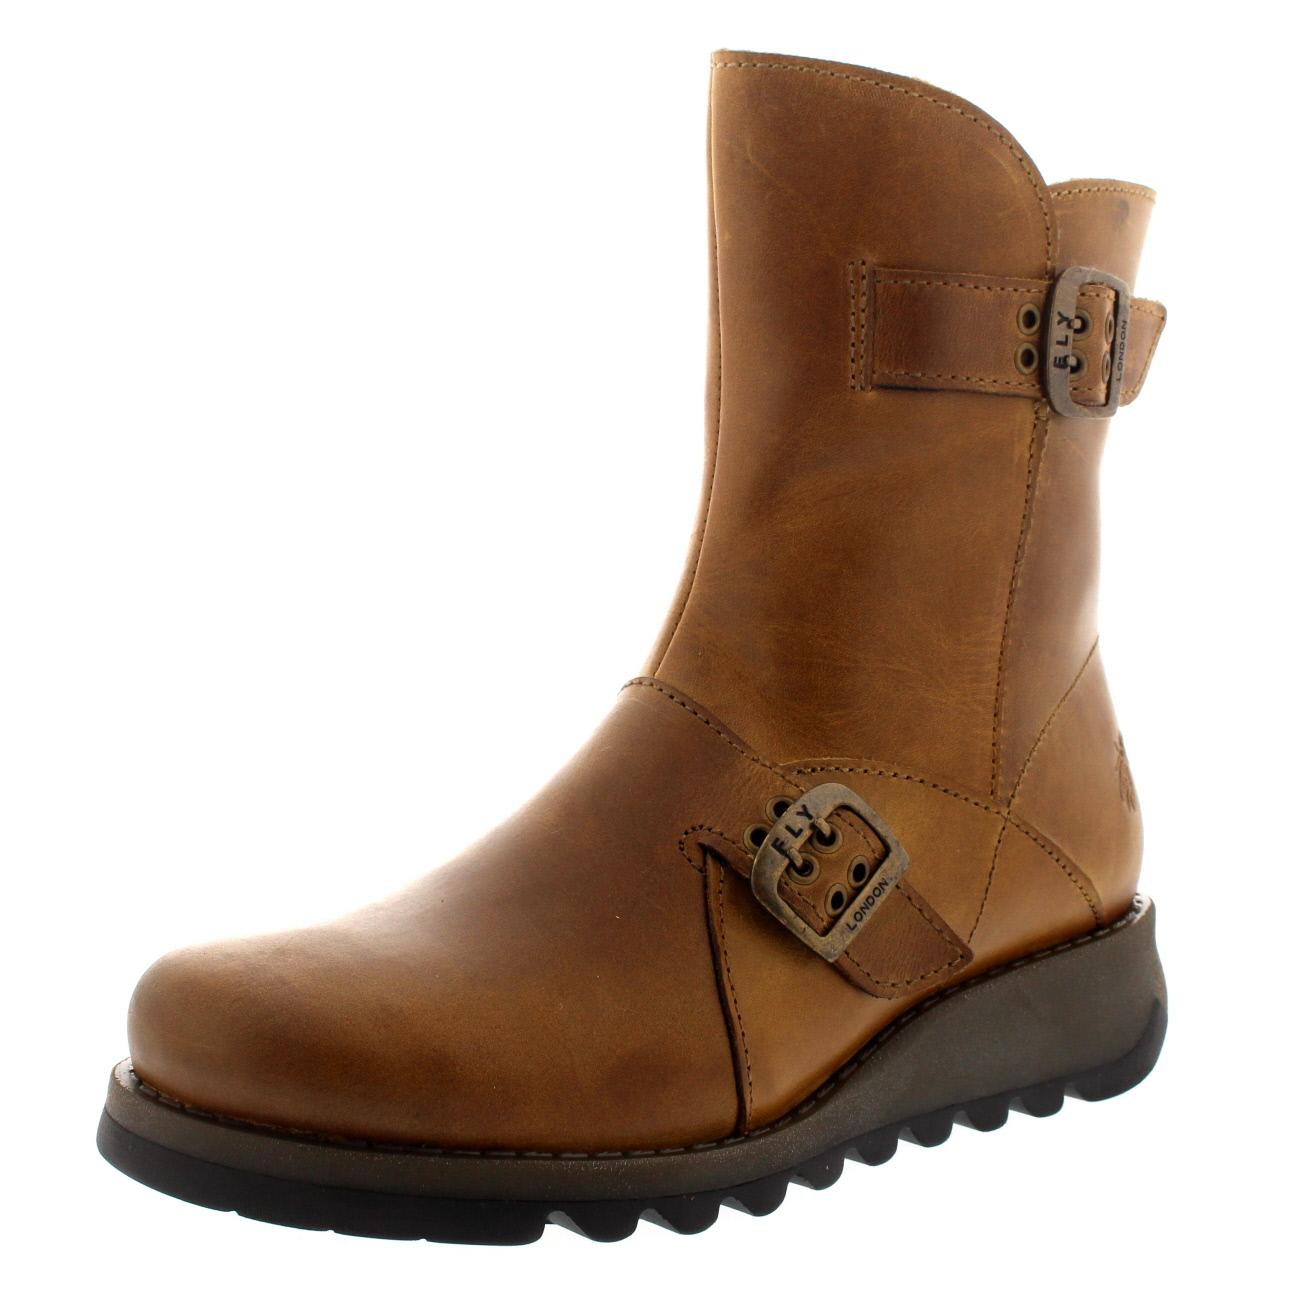 LOWA Desert BOOTS- elite  -Combat Boots Boots -Combat  WOMENS wide acd511